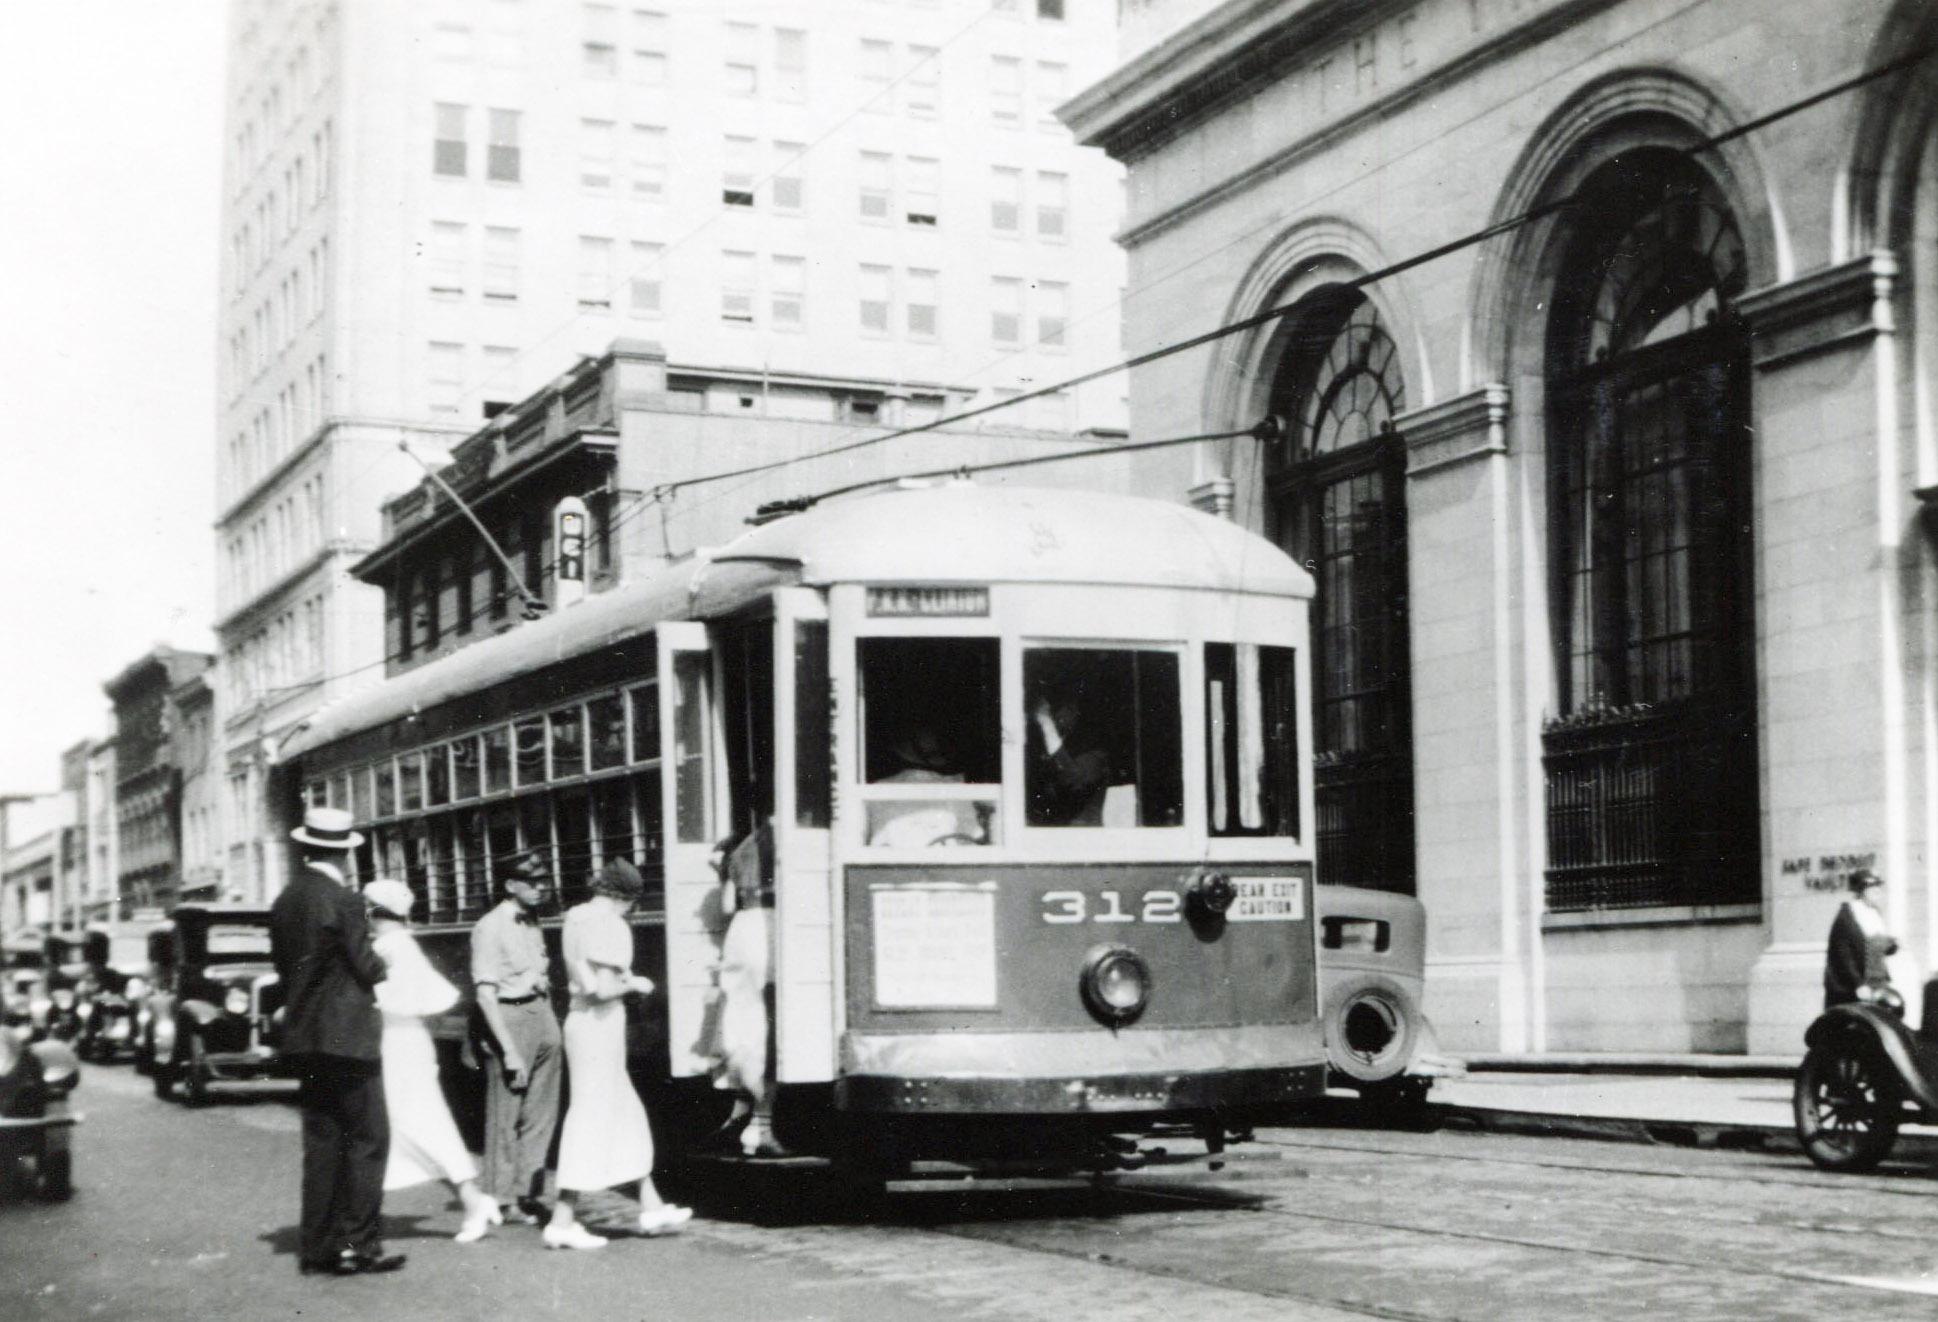 Trenton's Trolleys